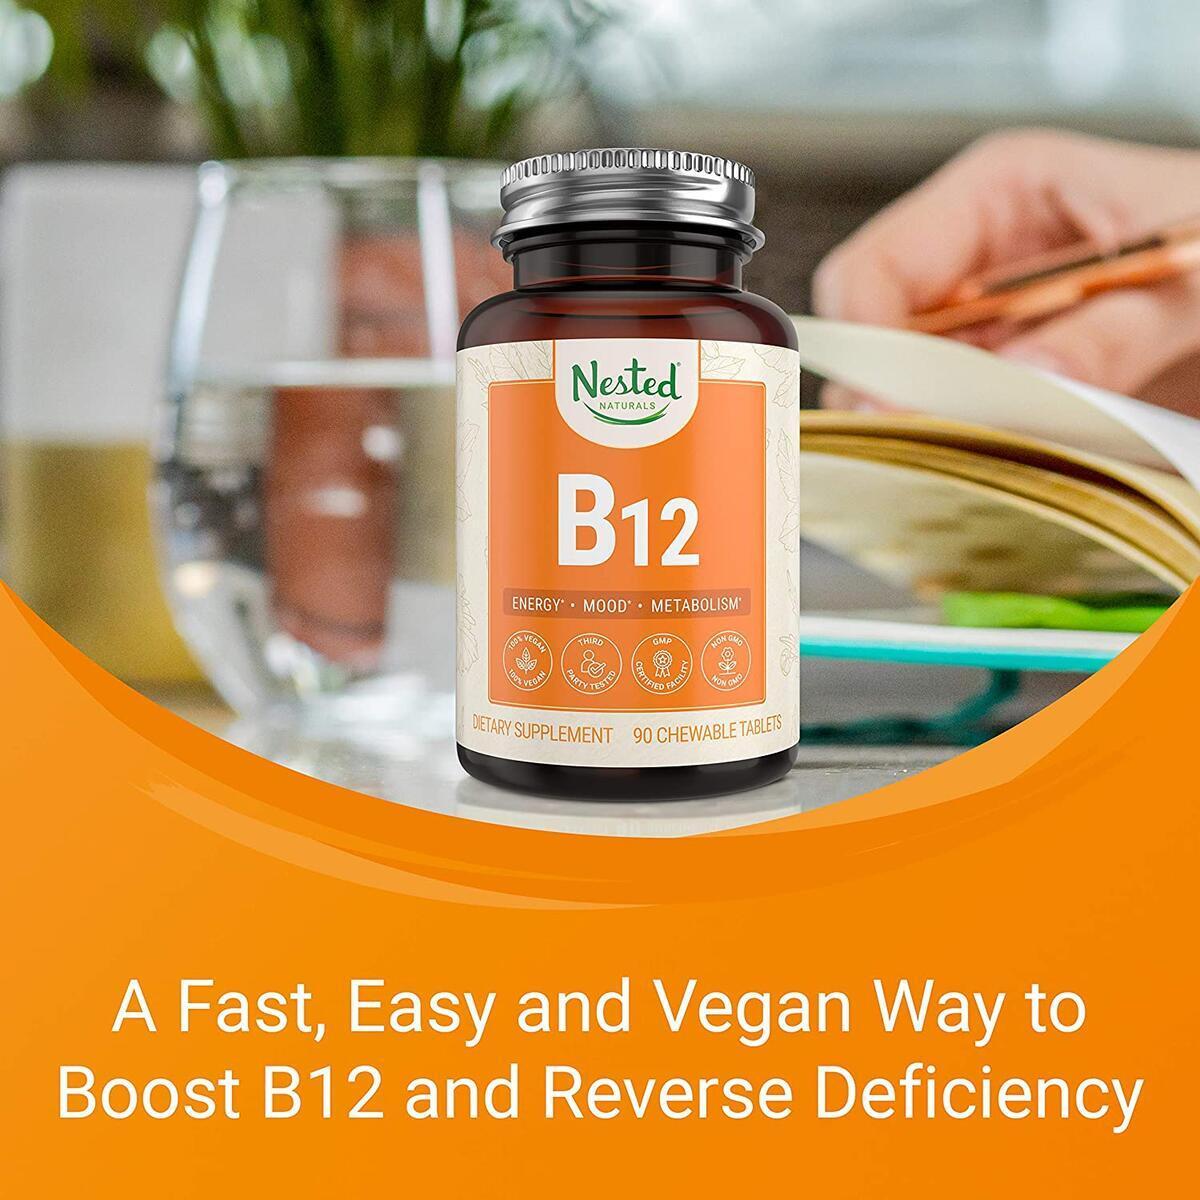 Nested Naturals Vegan Vitamin B12 2500mcg (Methylcobalamin) | Support Metabolism and Nervous System Health | Fast Dissolve Chewable Tablets